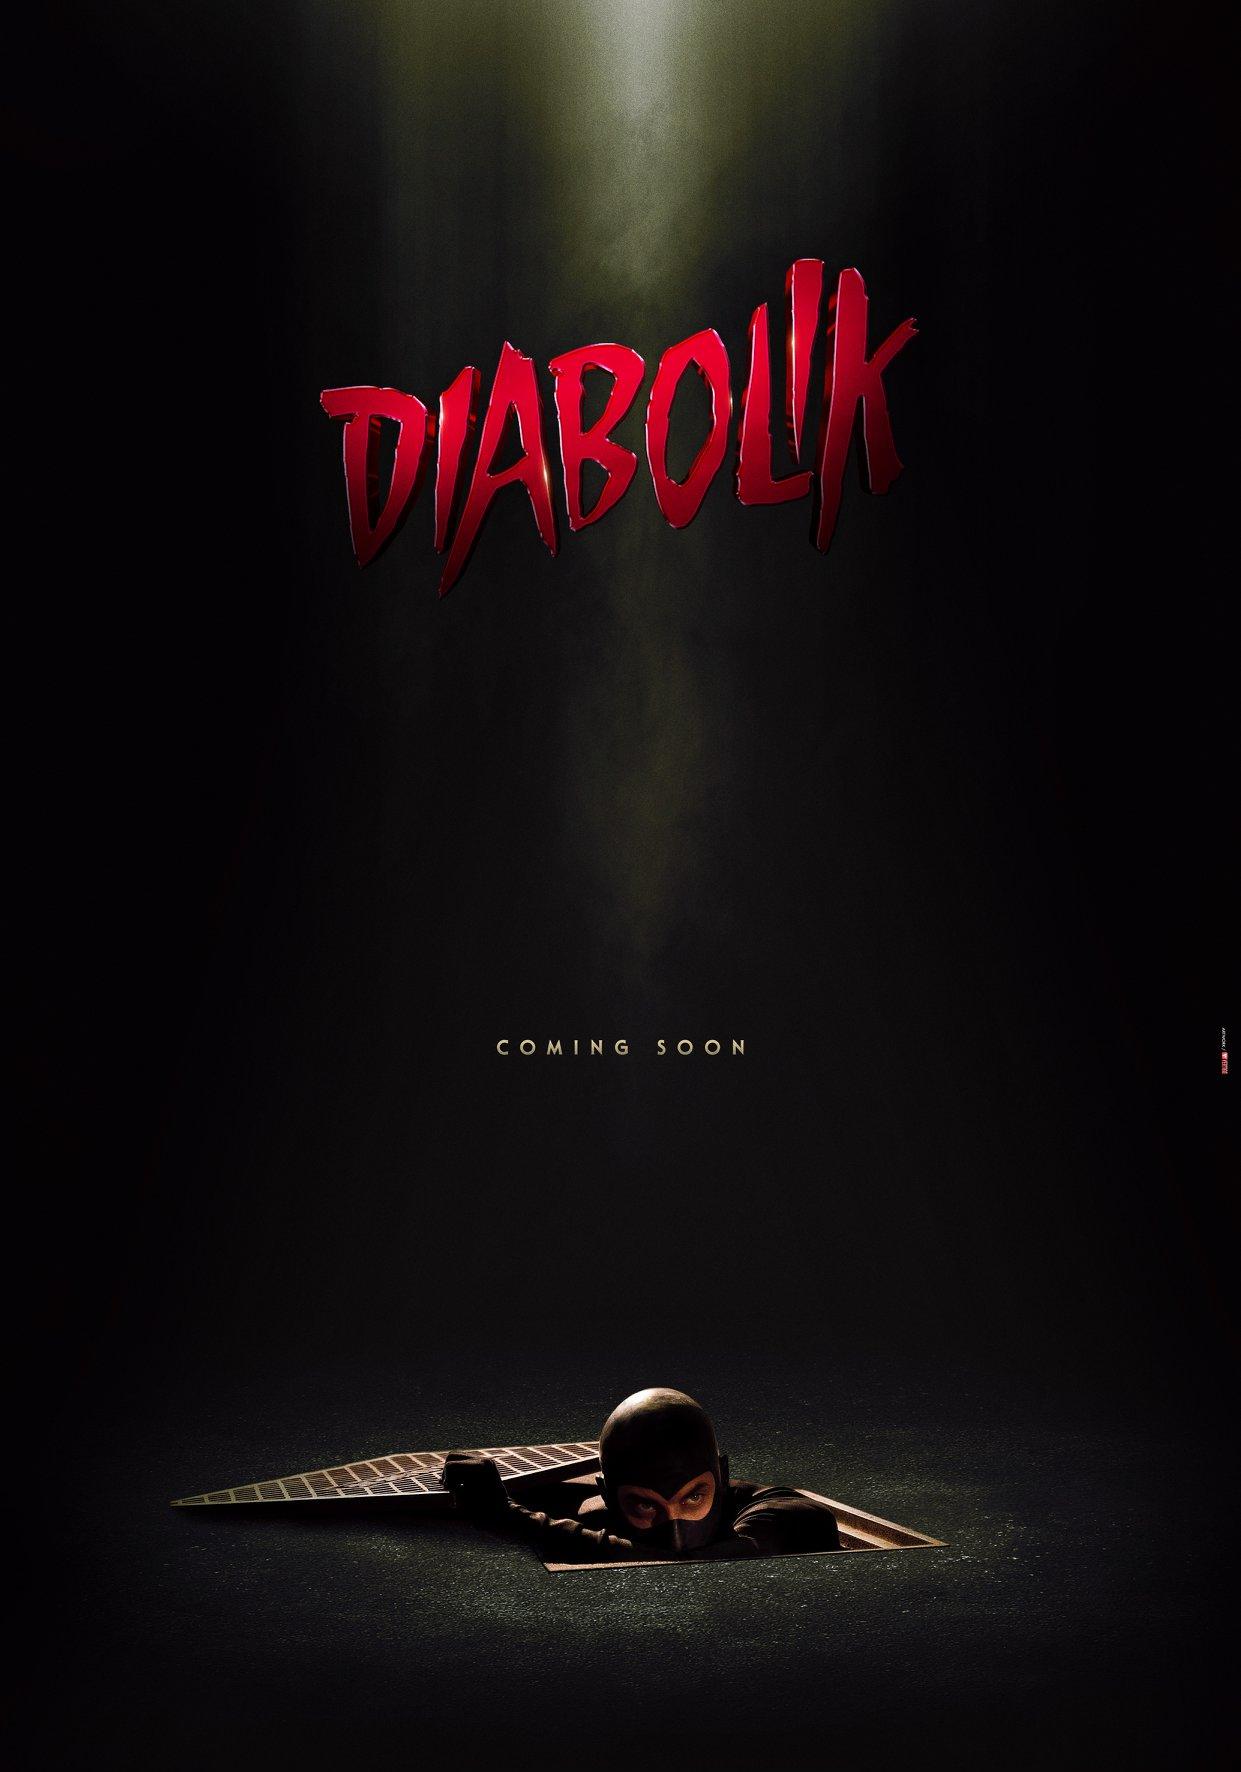 Diabolik - Il poster